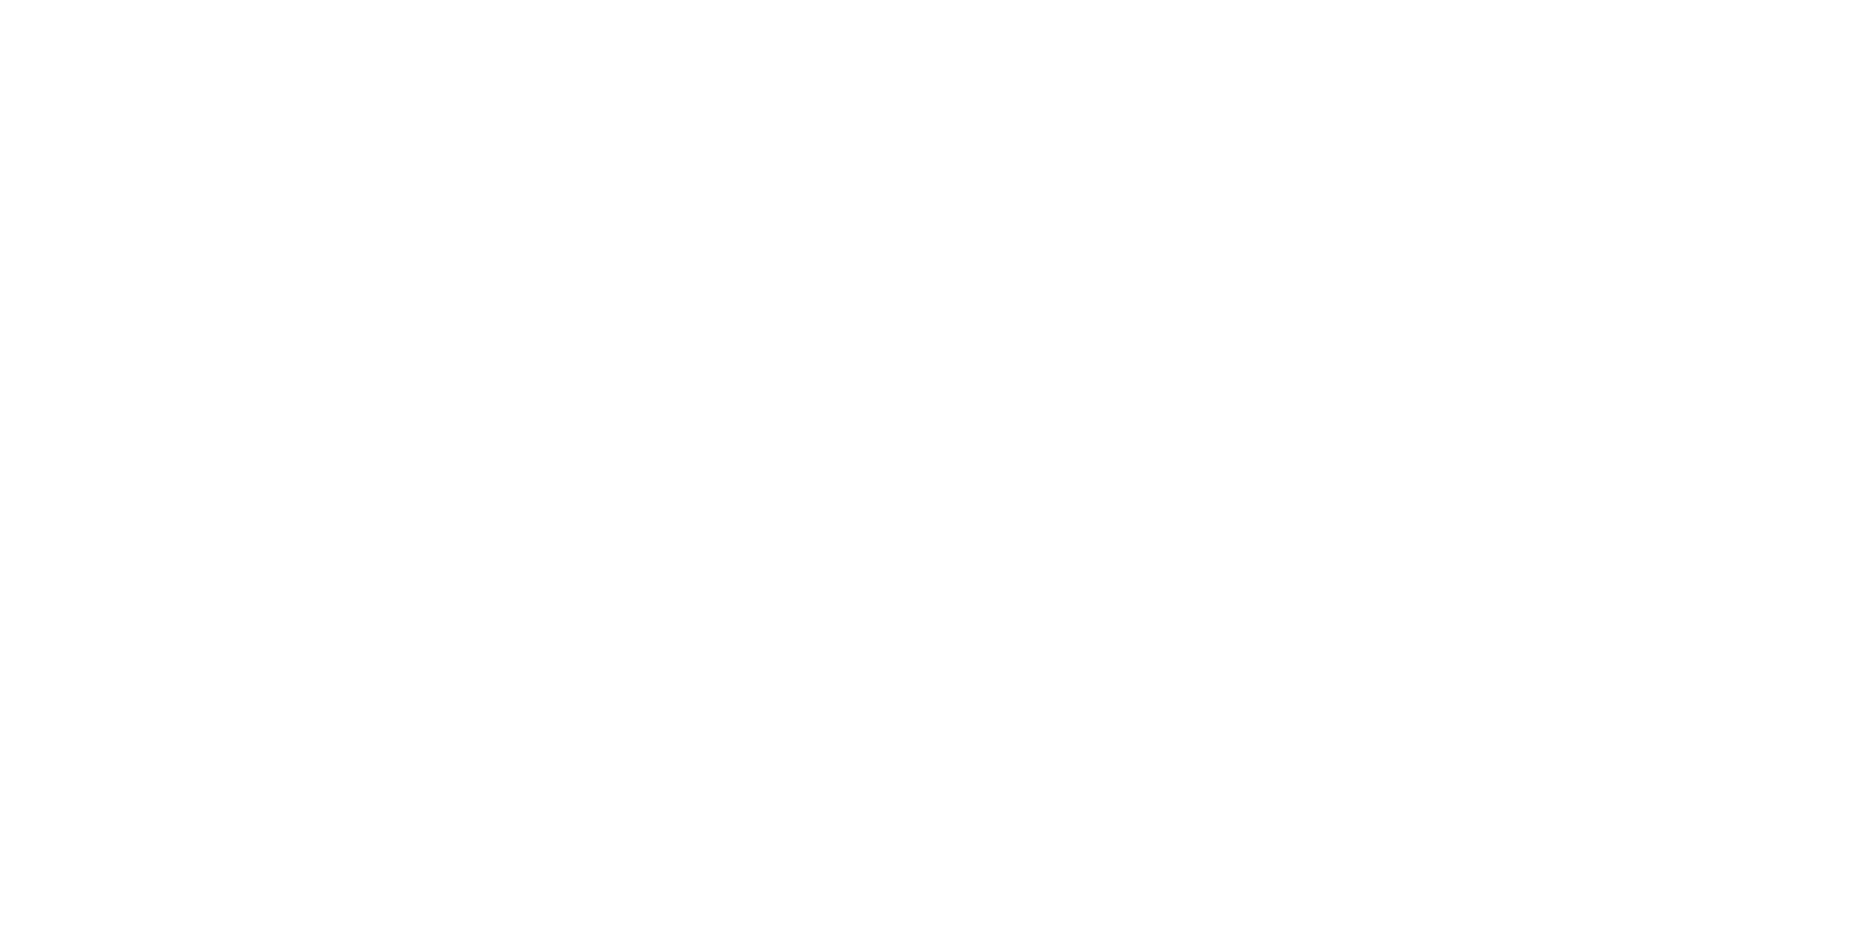 logo-design-6 2